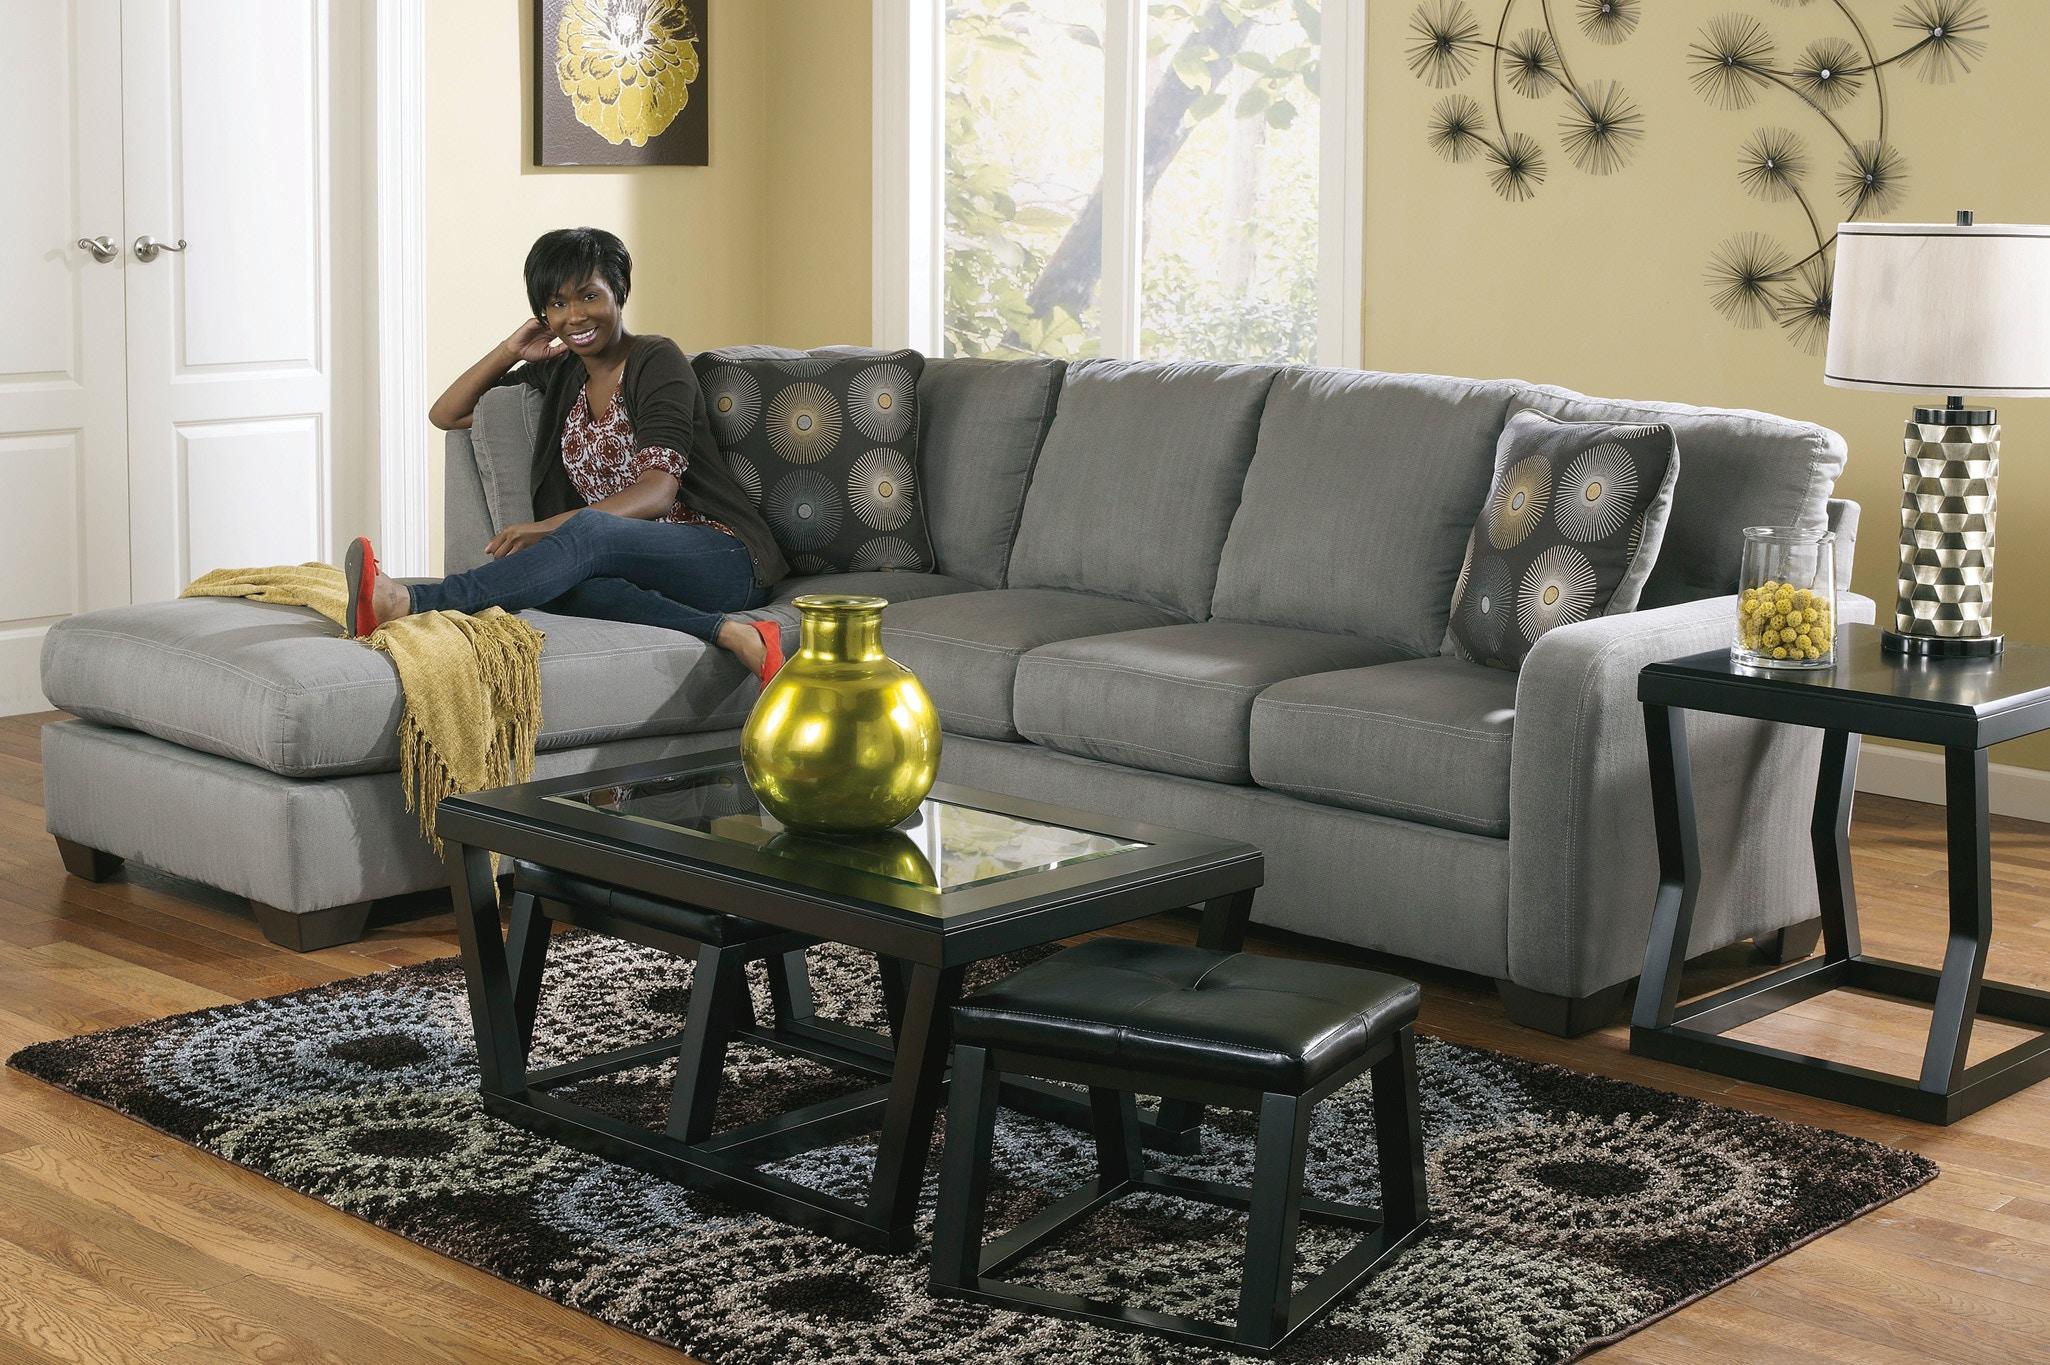 Signature Design by Ashley Zella Charcoal Left Chaise Sectional 582225 : ashley chaise - Sectionals, Sofas & Couches